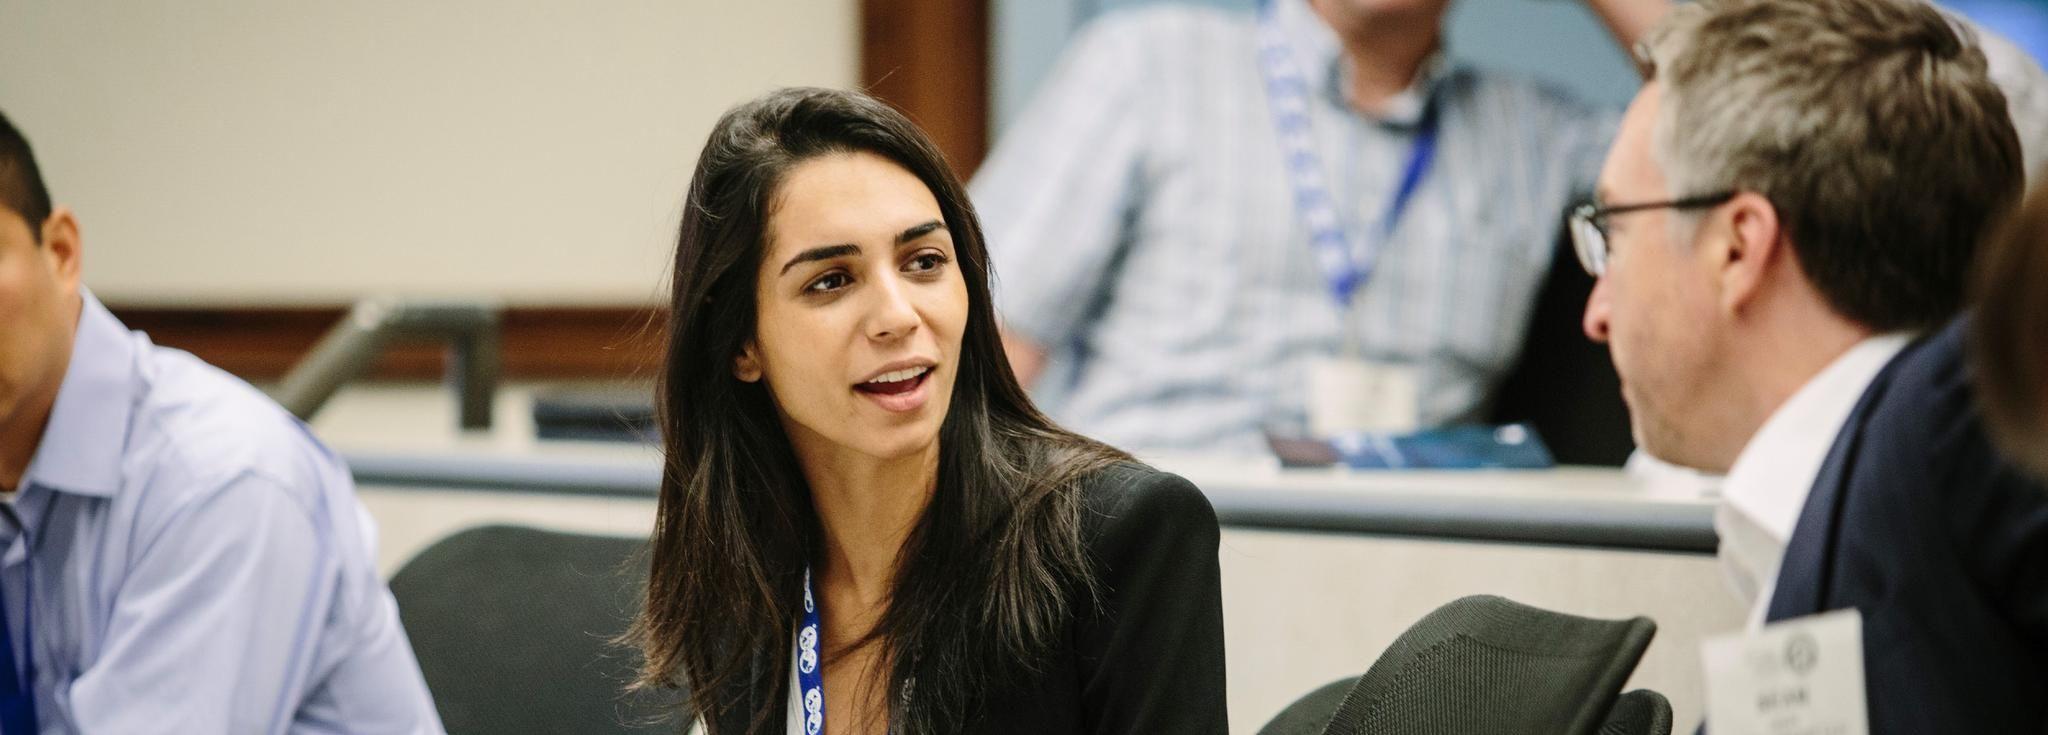 Young Professionals at OTC 2020